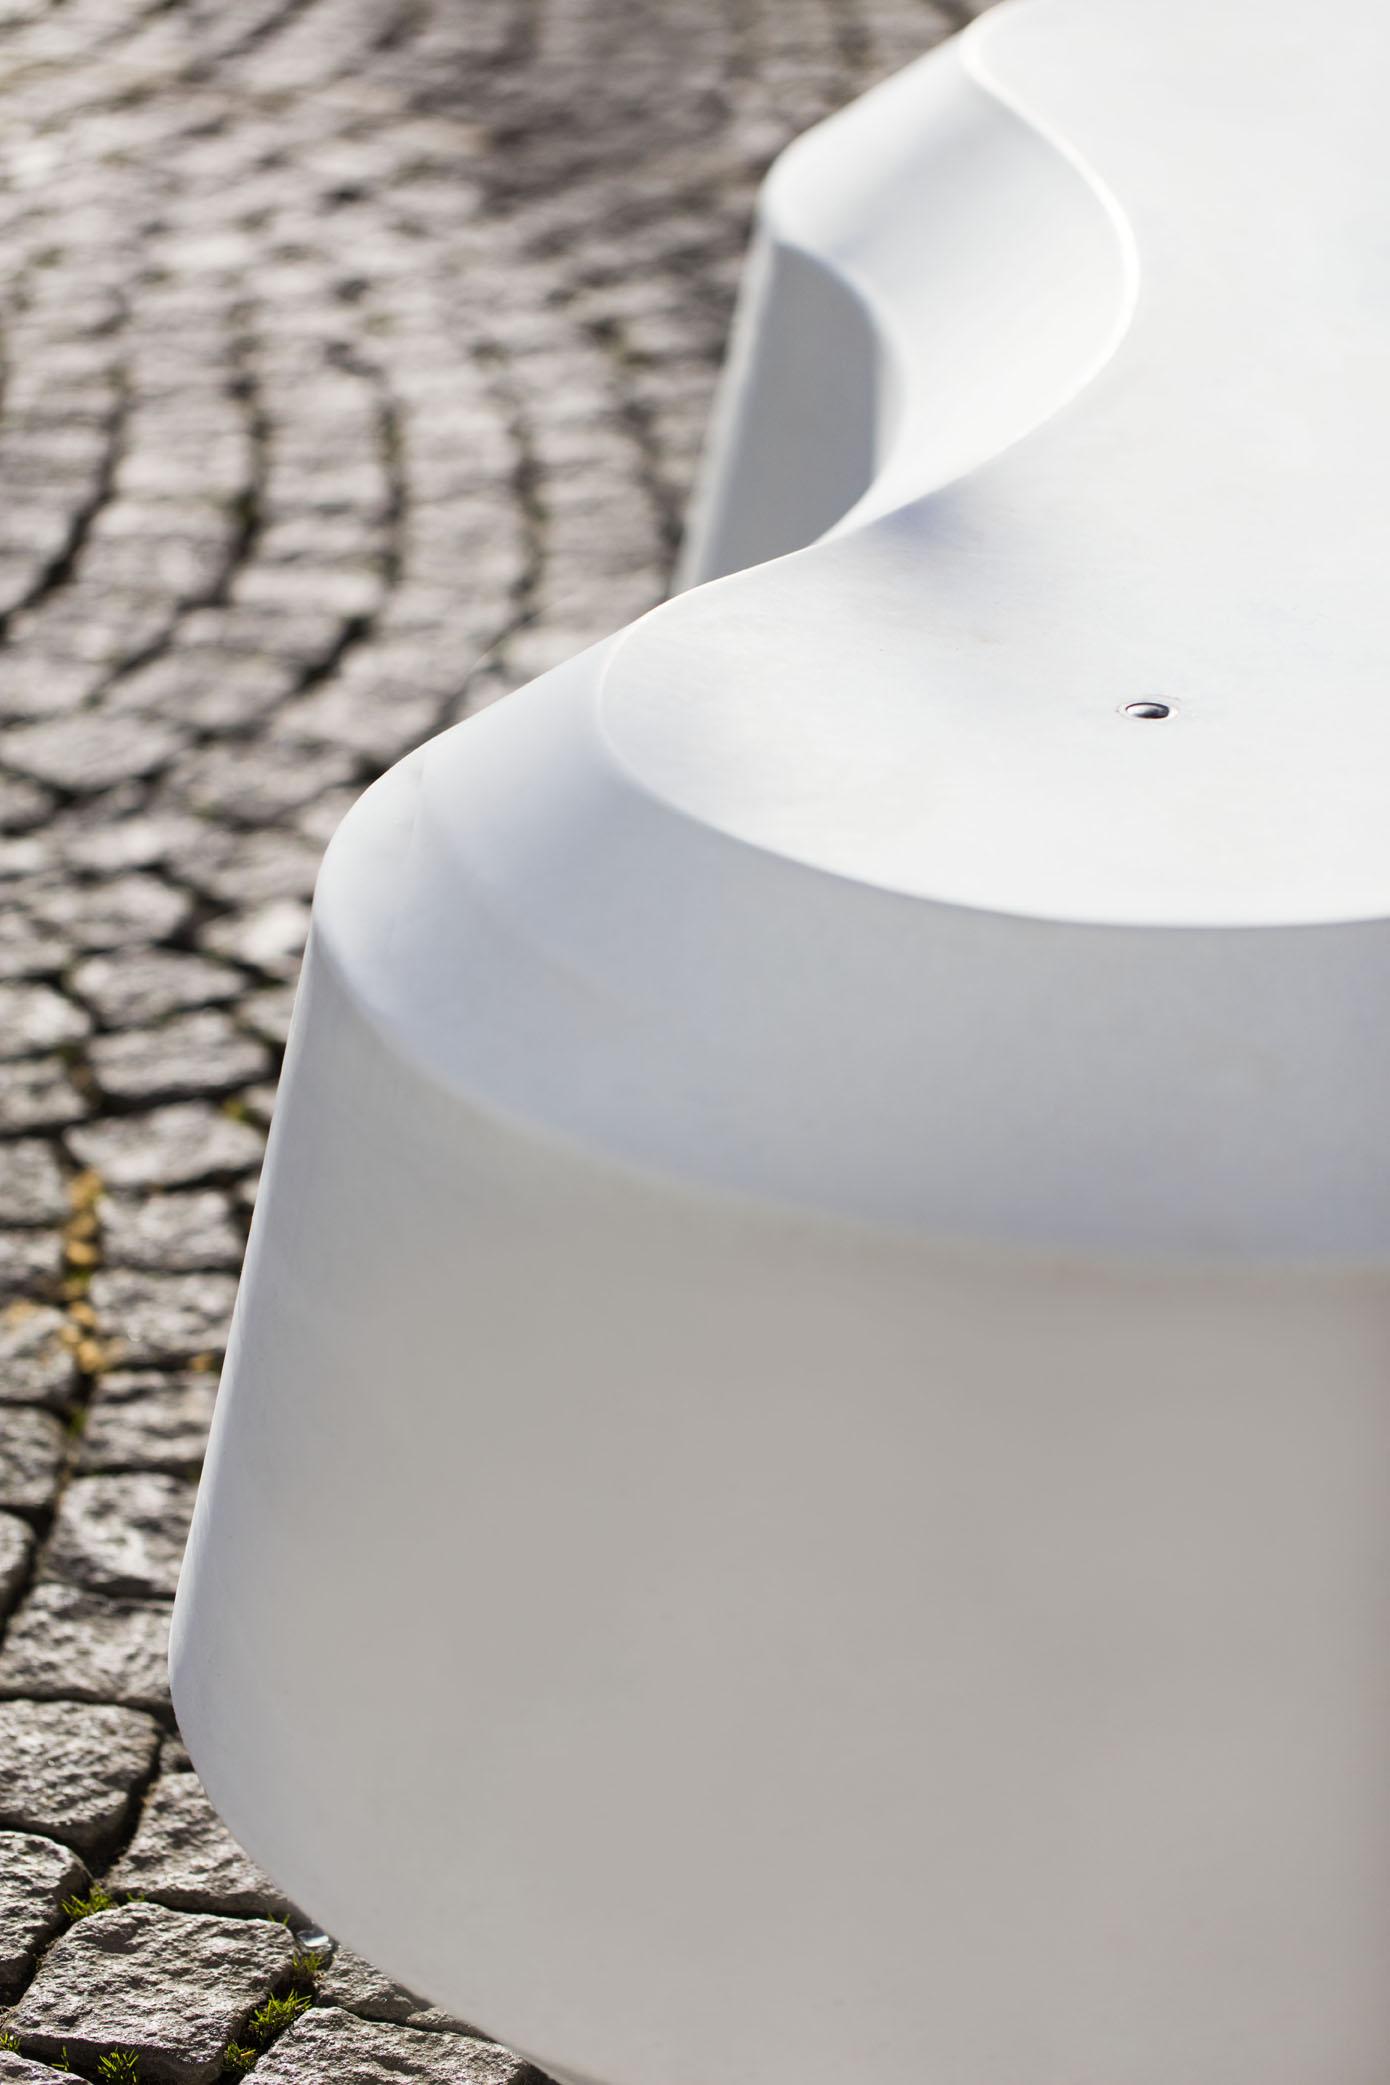 Obstruct zitelement van gewapend beton